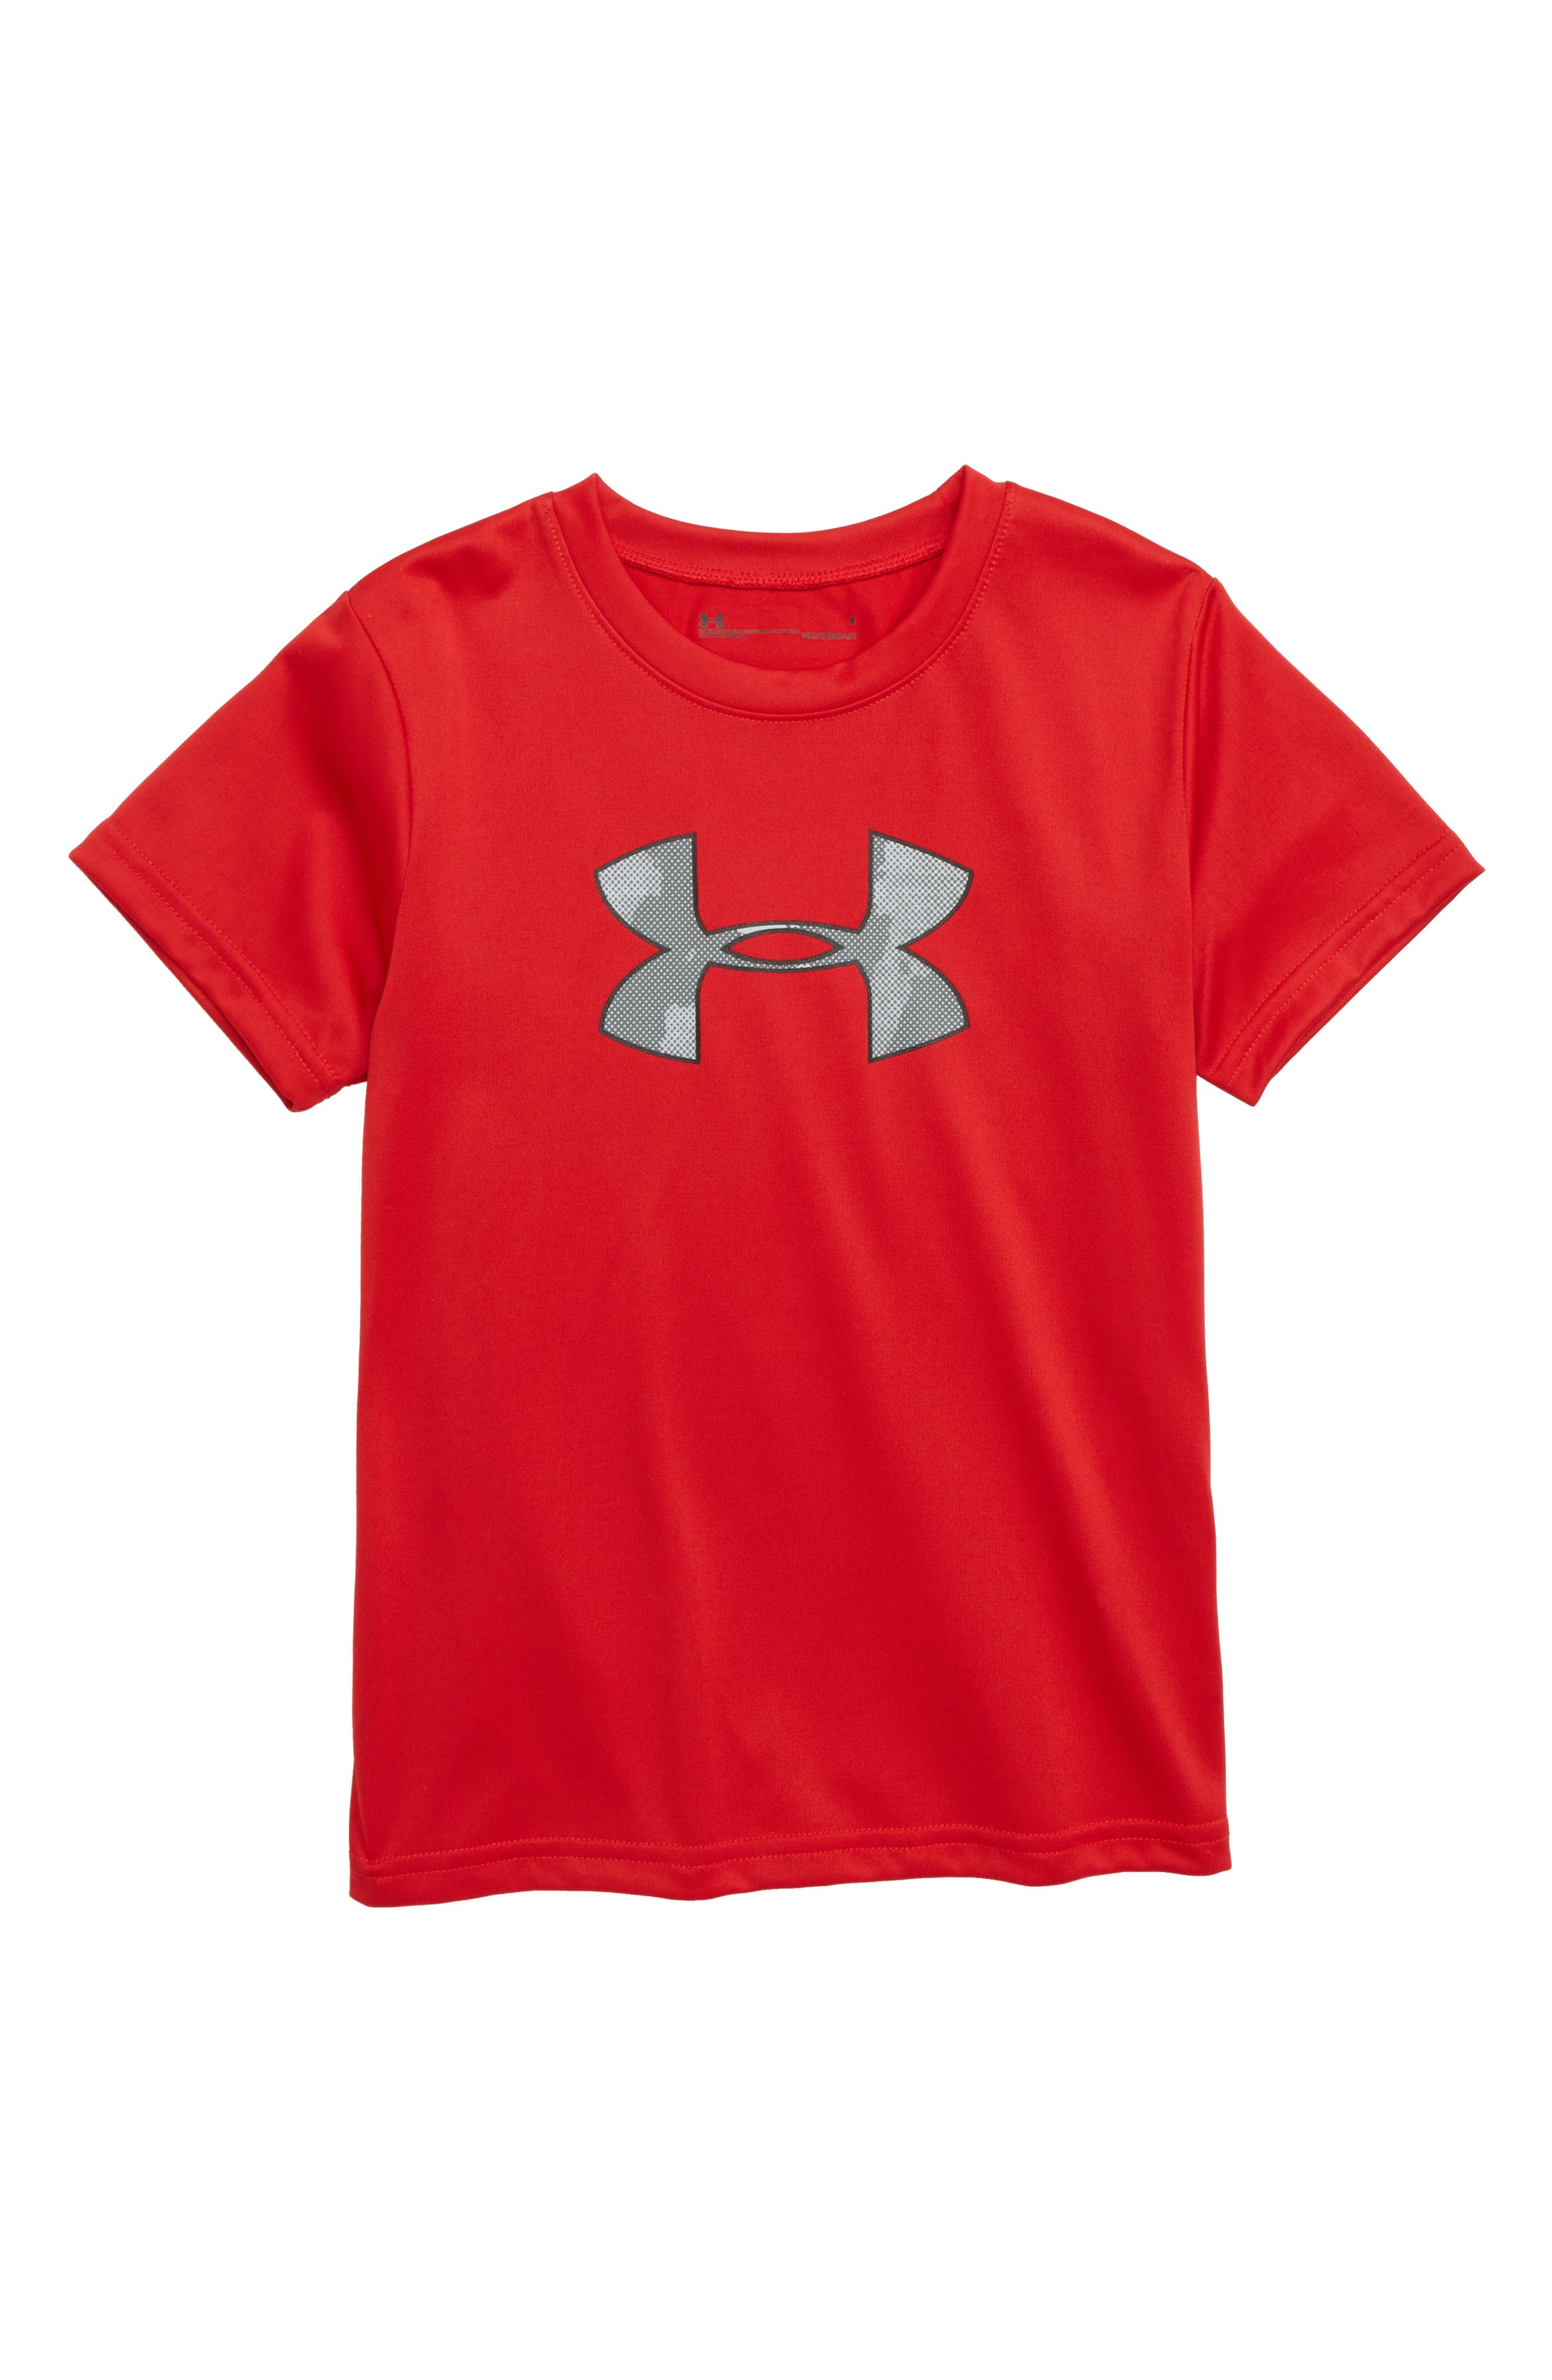 UNDER ARMOUR,                             Traverse Camo Logo T-Shirt,                             Main thumbnail 1, color,                             600